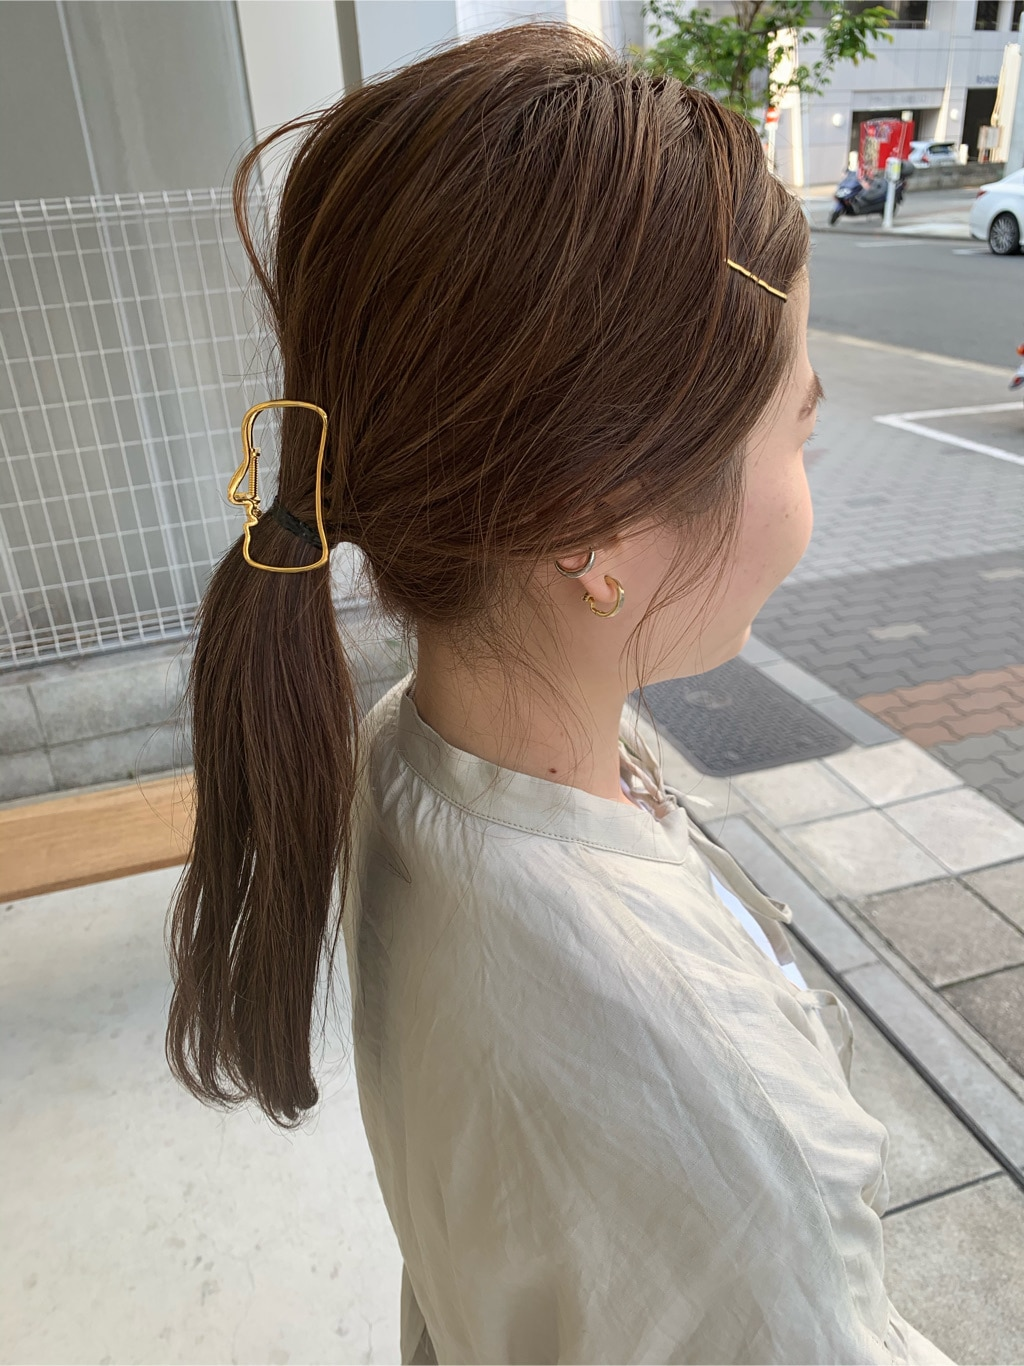 l'atelier du savon 名古屋栄路面 身長:159cm 2020.05.19